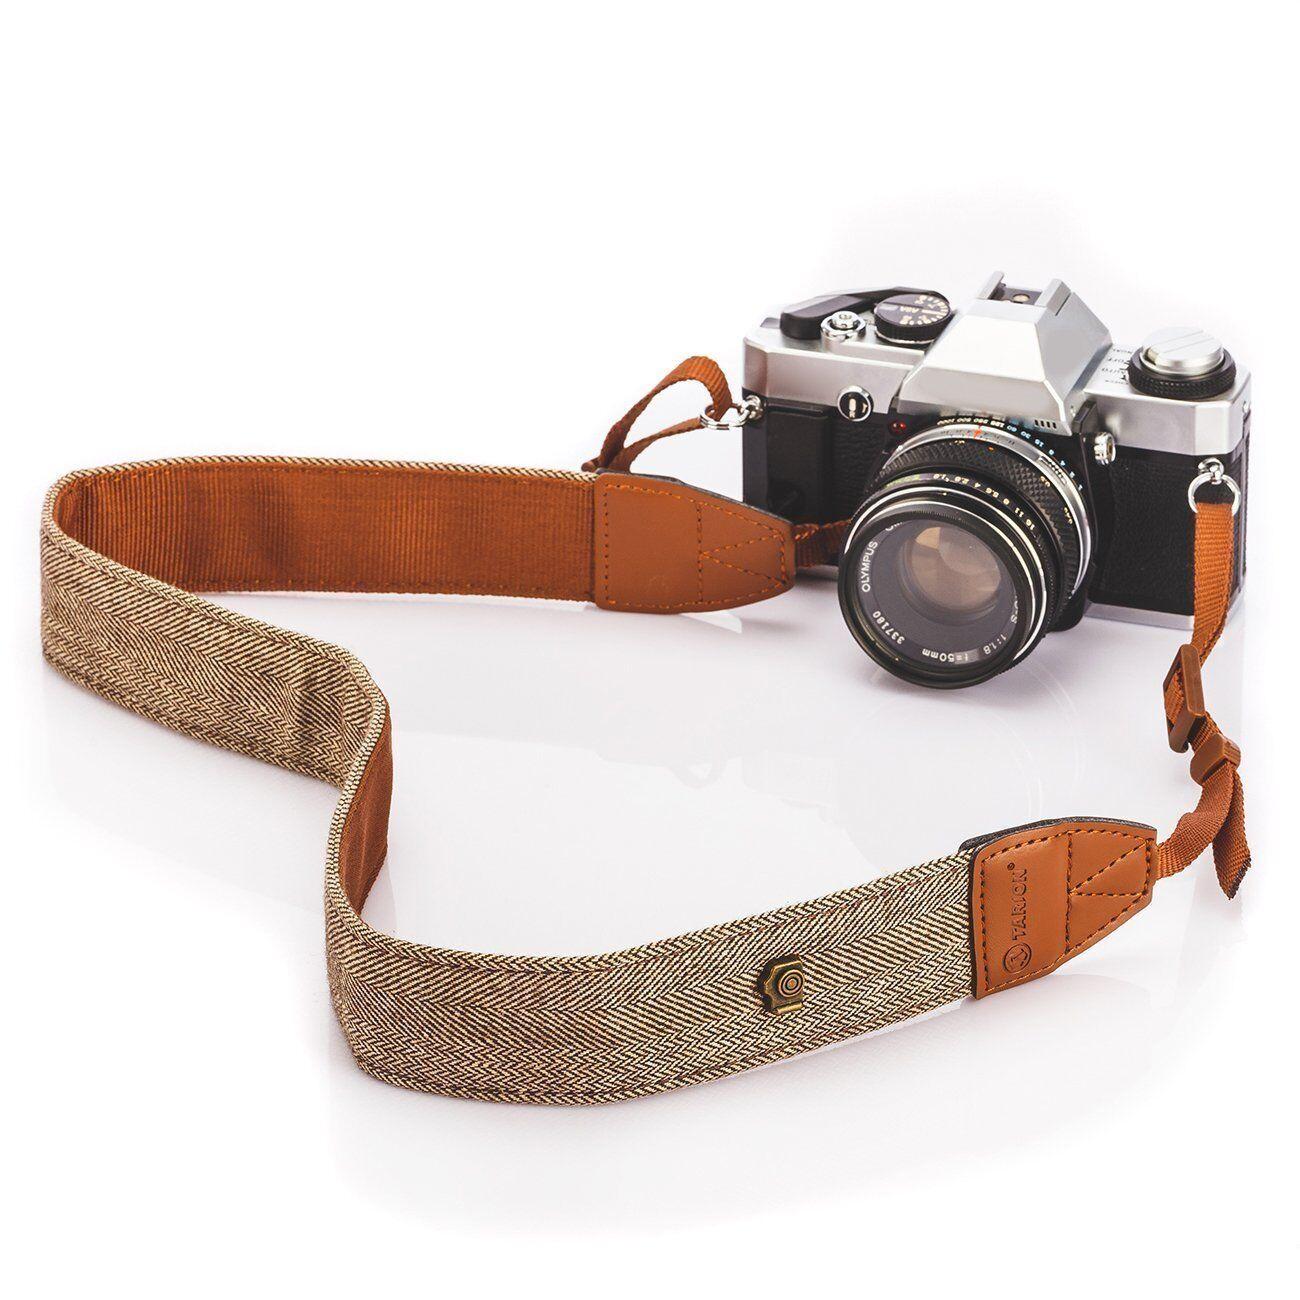 Купить Unbranded/Generic - Vintage Classic White and Brown Weave Camera Shoulder Neck Strap Belt Canon DSLR